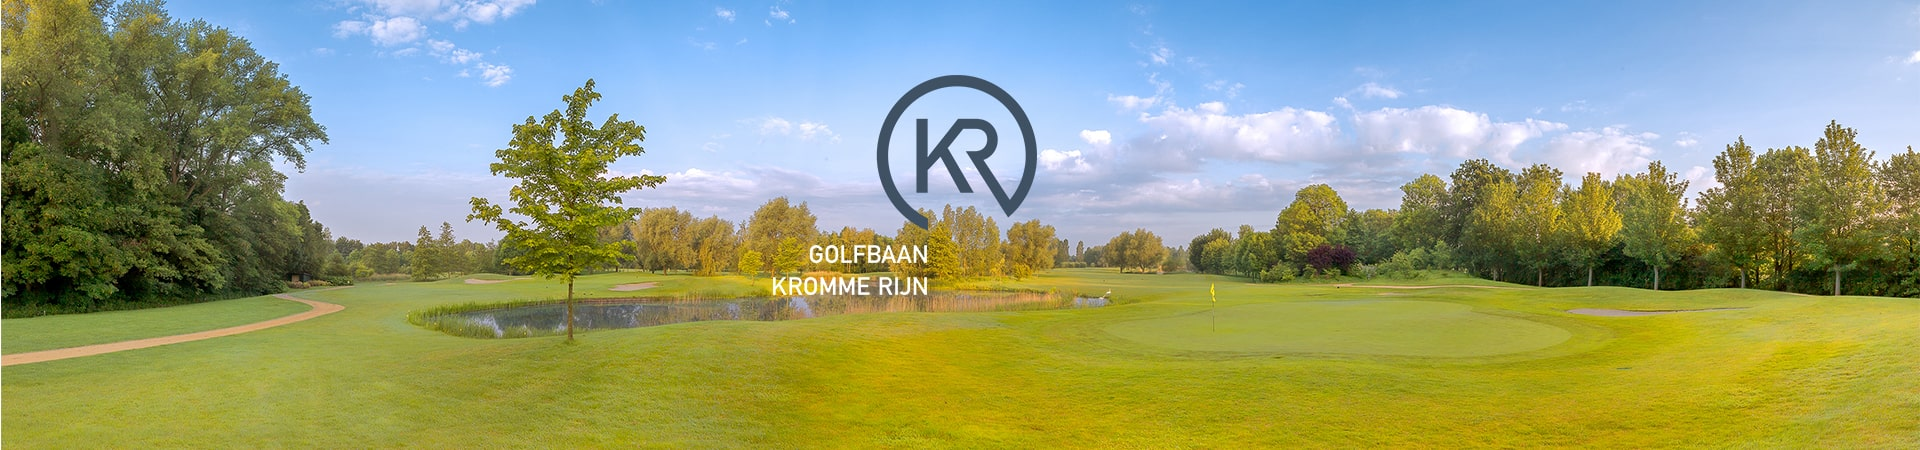 header golfbaan logo 02